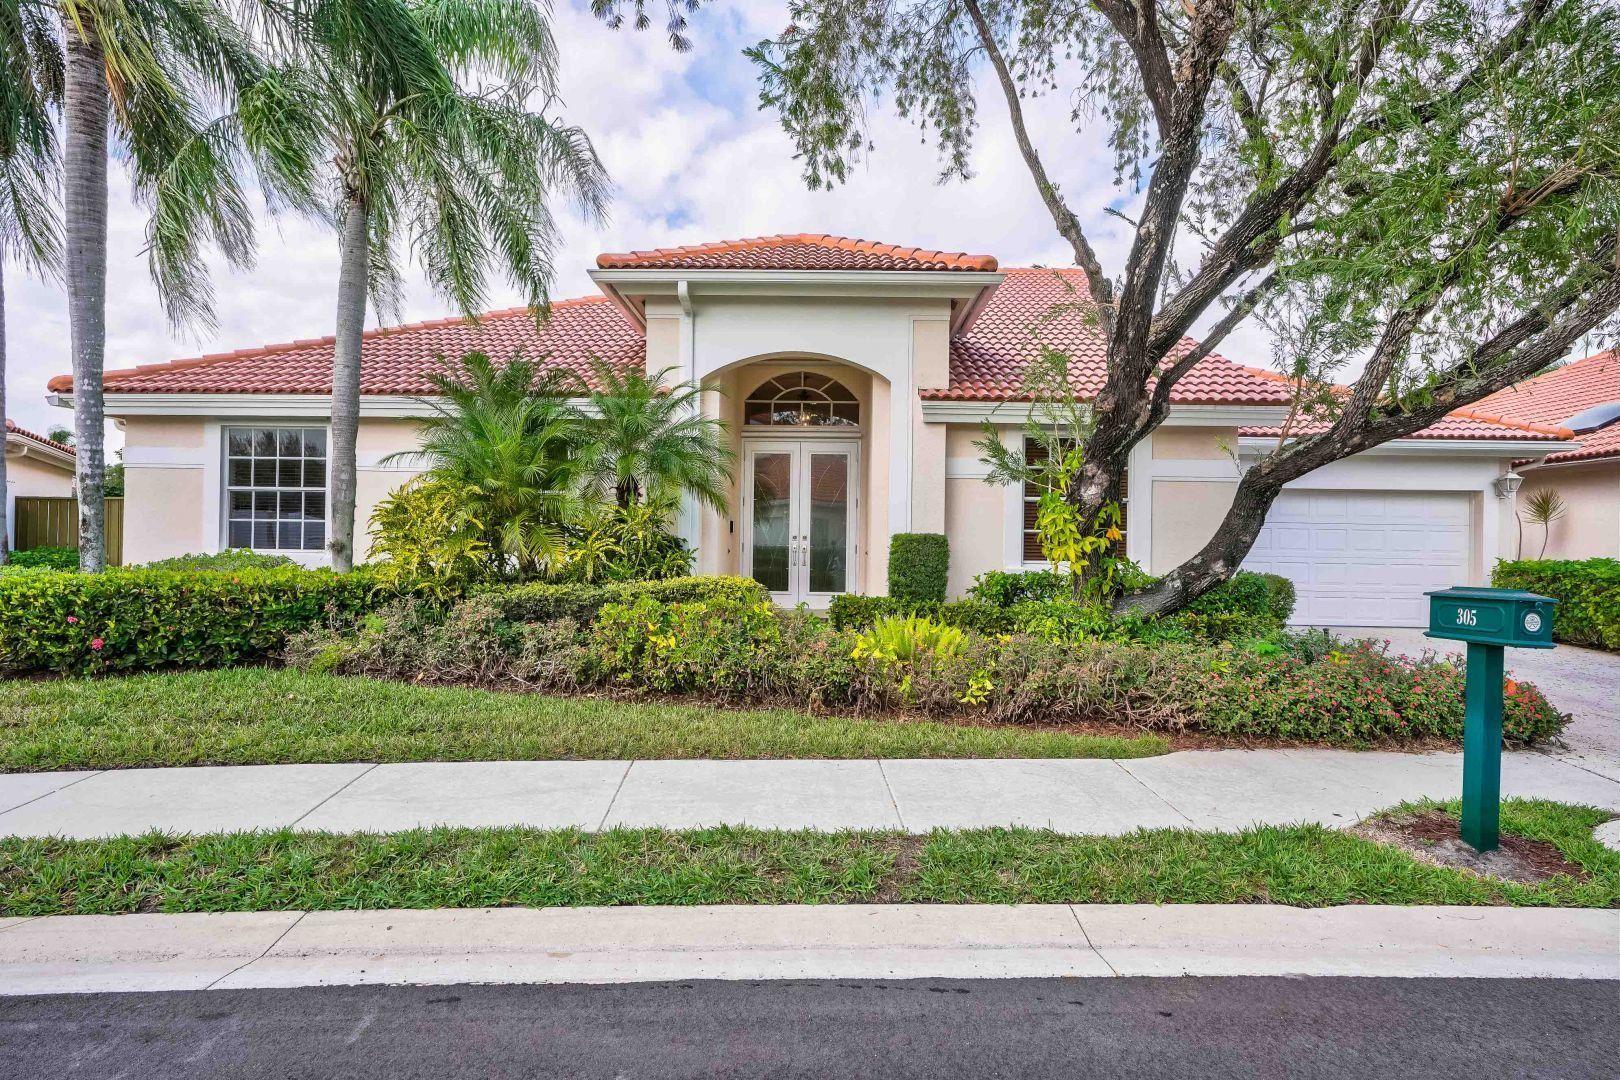 Photo of 305 Eagleton Estates Drive, Palm Beach Gardens, FL 33418 (MLS # RX-10694382)